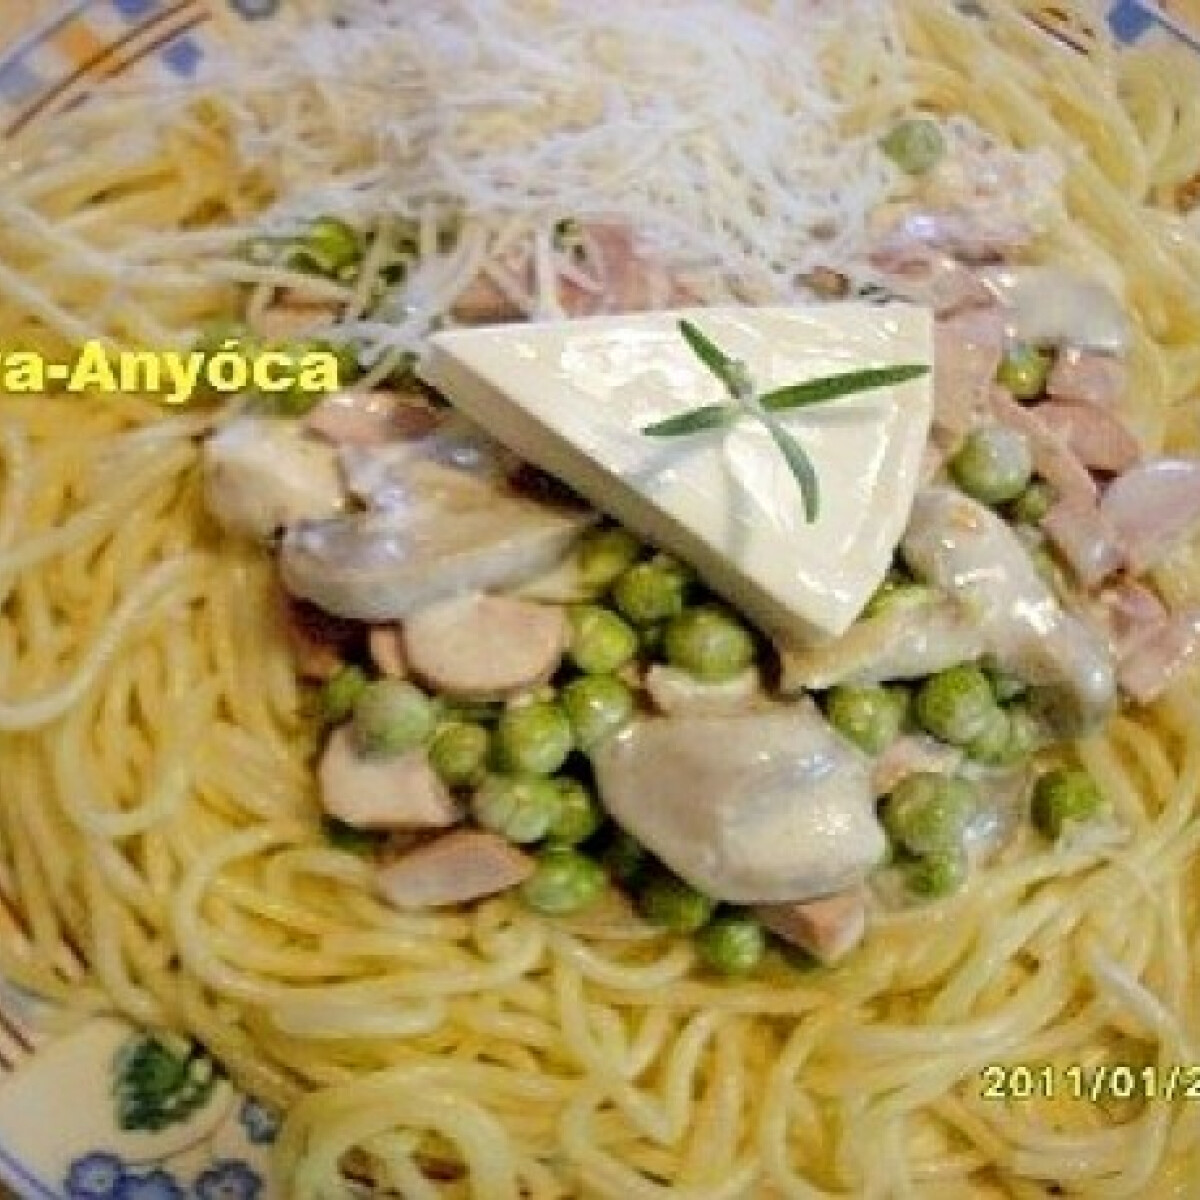 Krémsajtos zöldborsó spagettivel